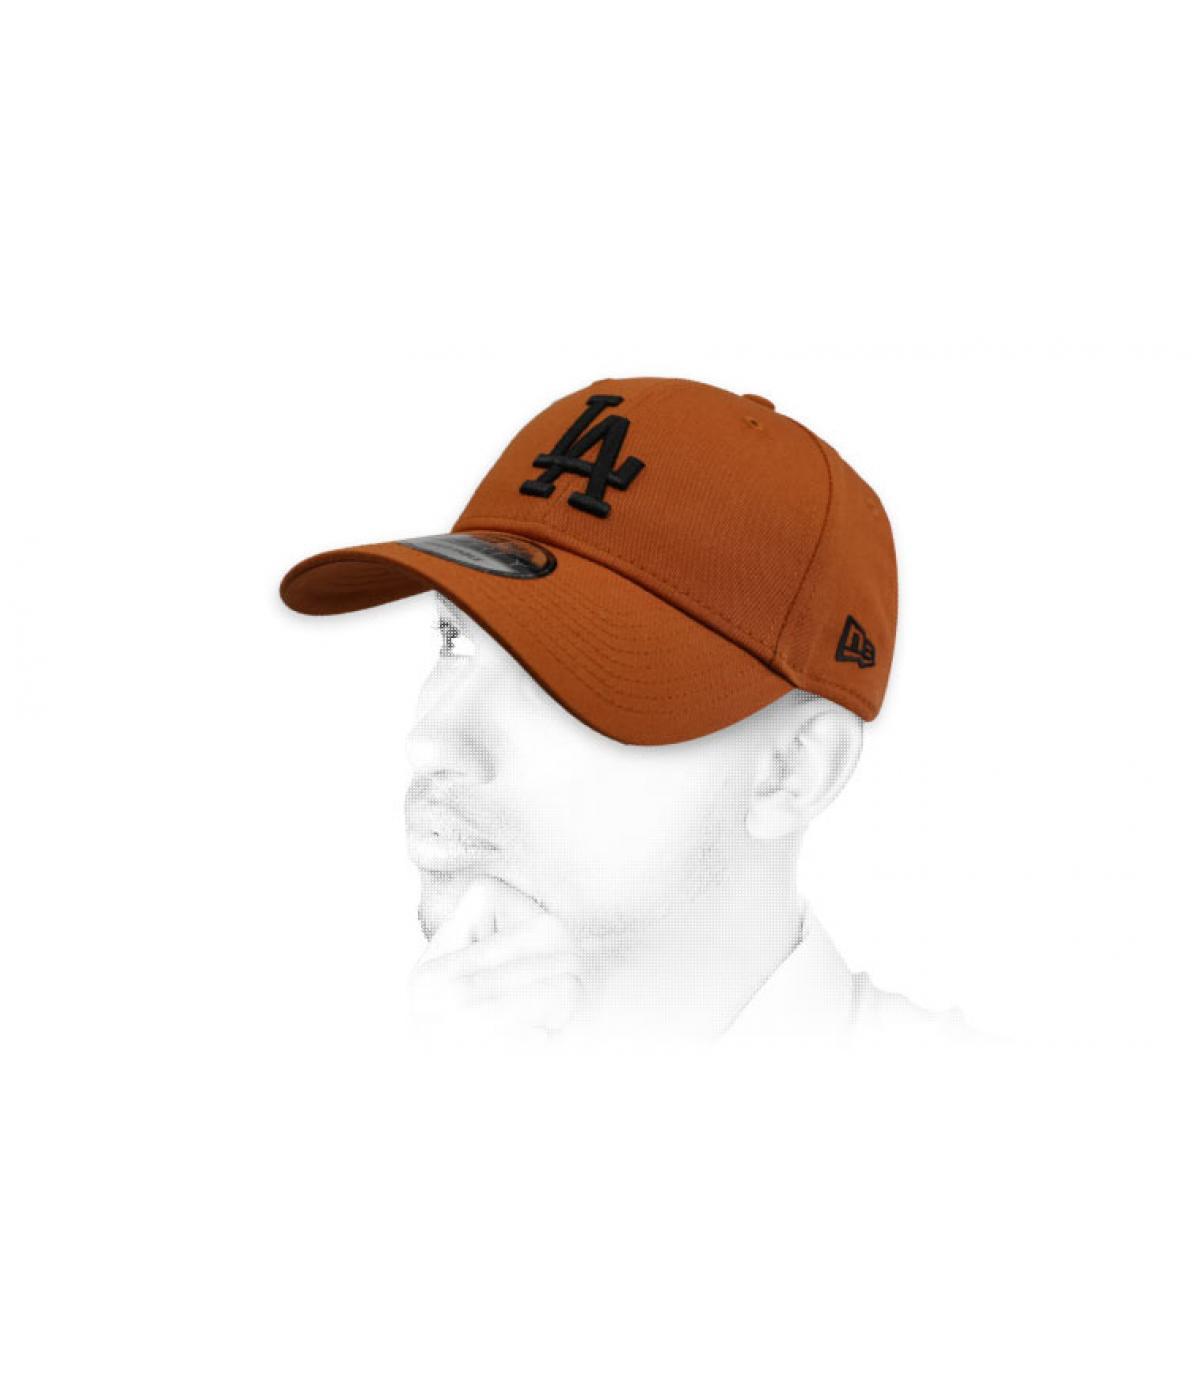 black brown LA cap